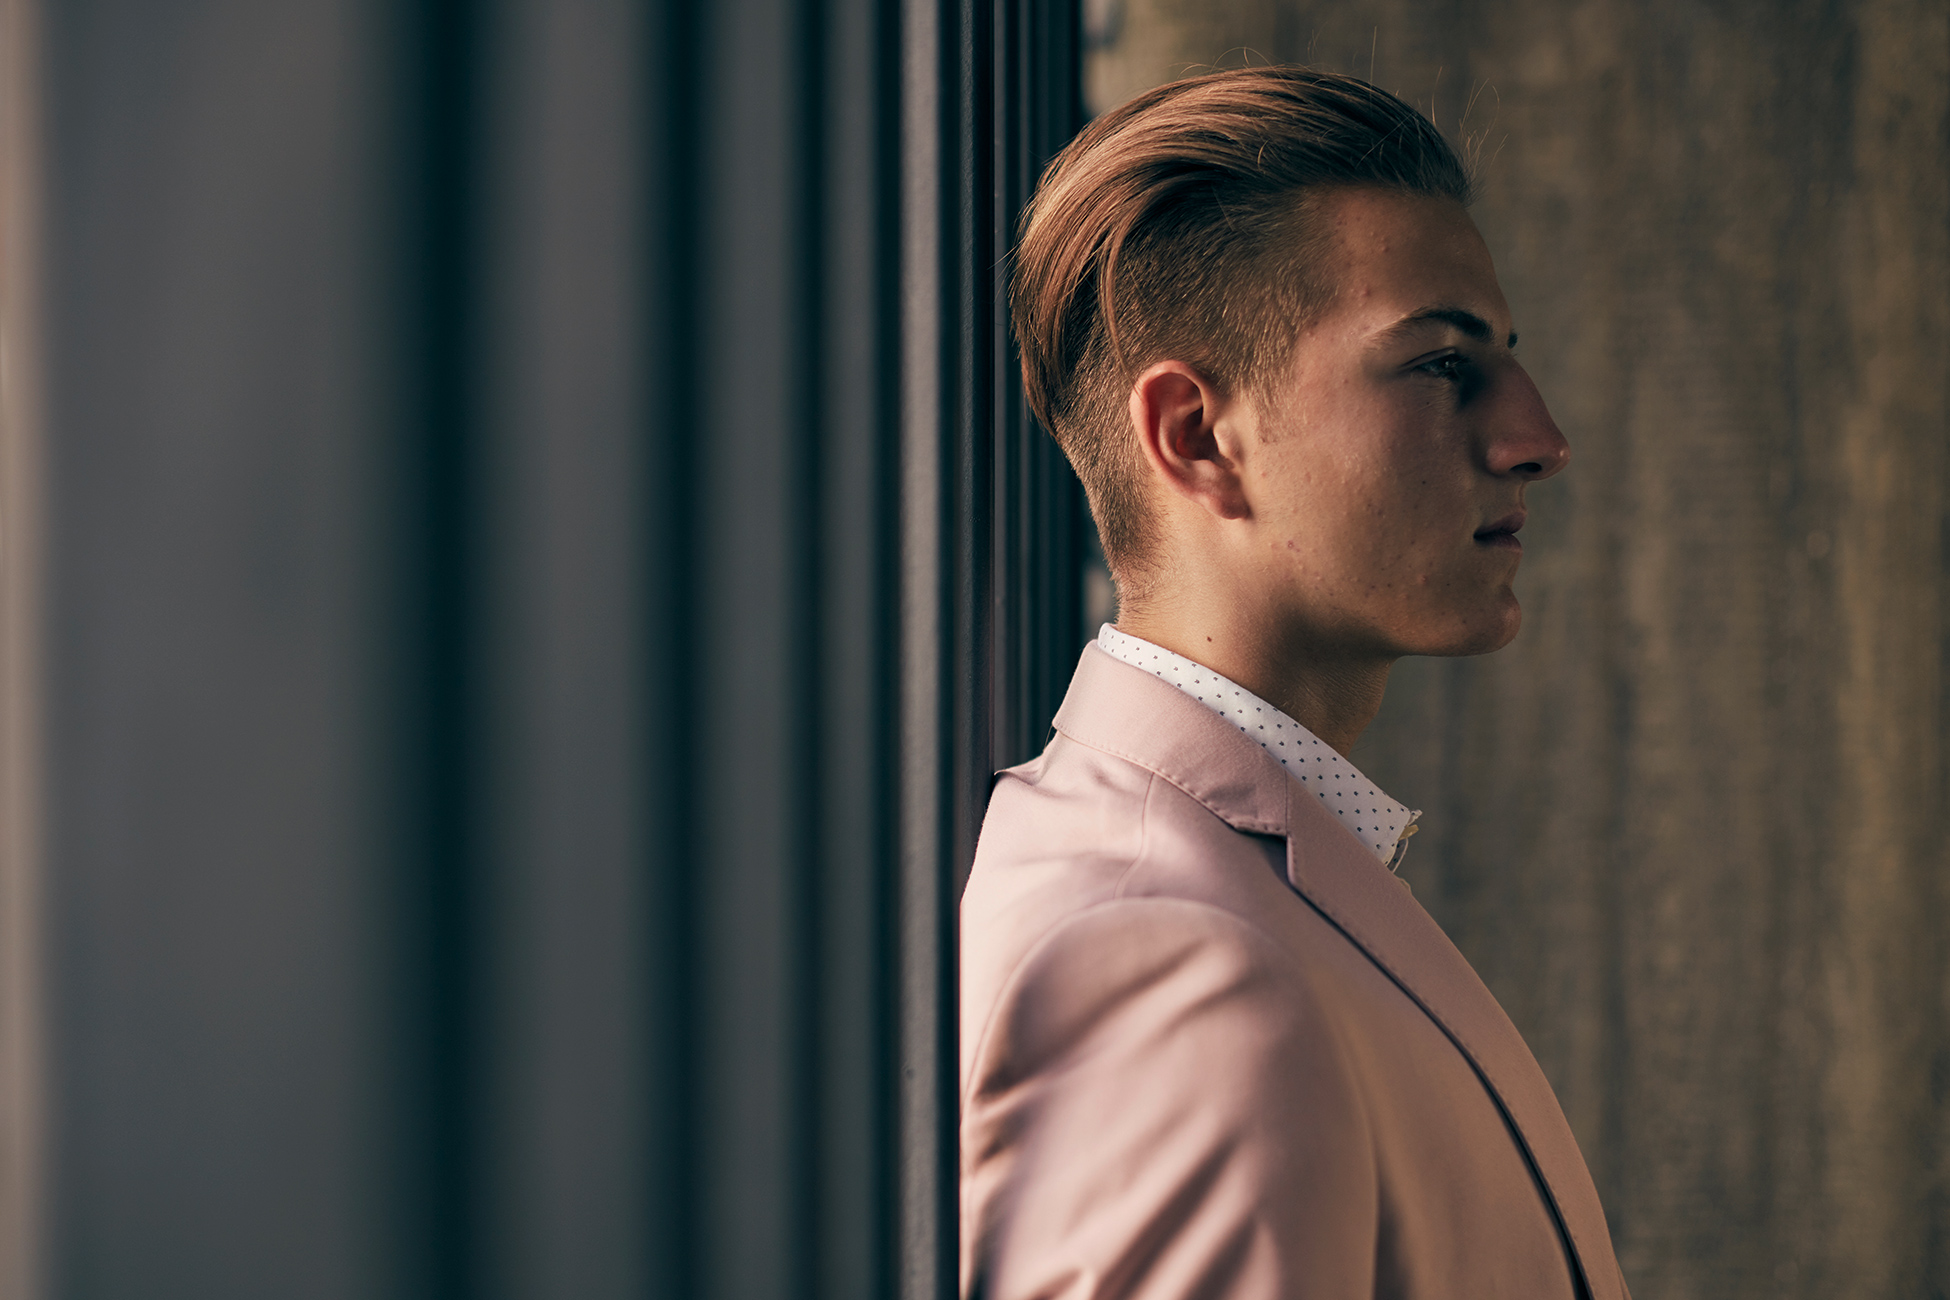 edward, lorenz, moll, portrait, berlin, anke luckmann, twins, suit